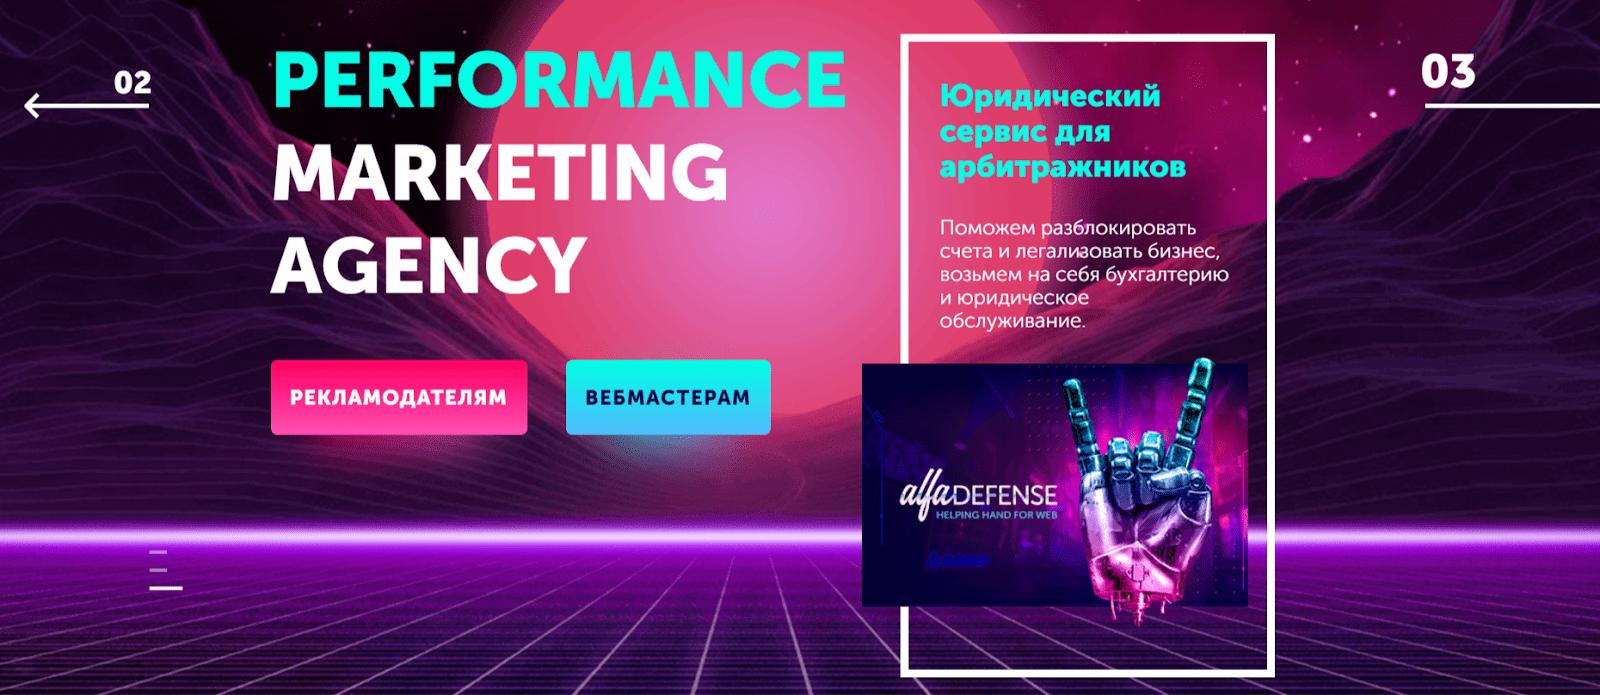 Alfaleads - Performance Marketing Agency